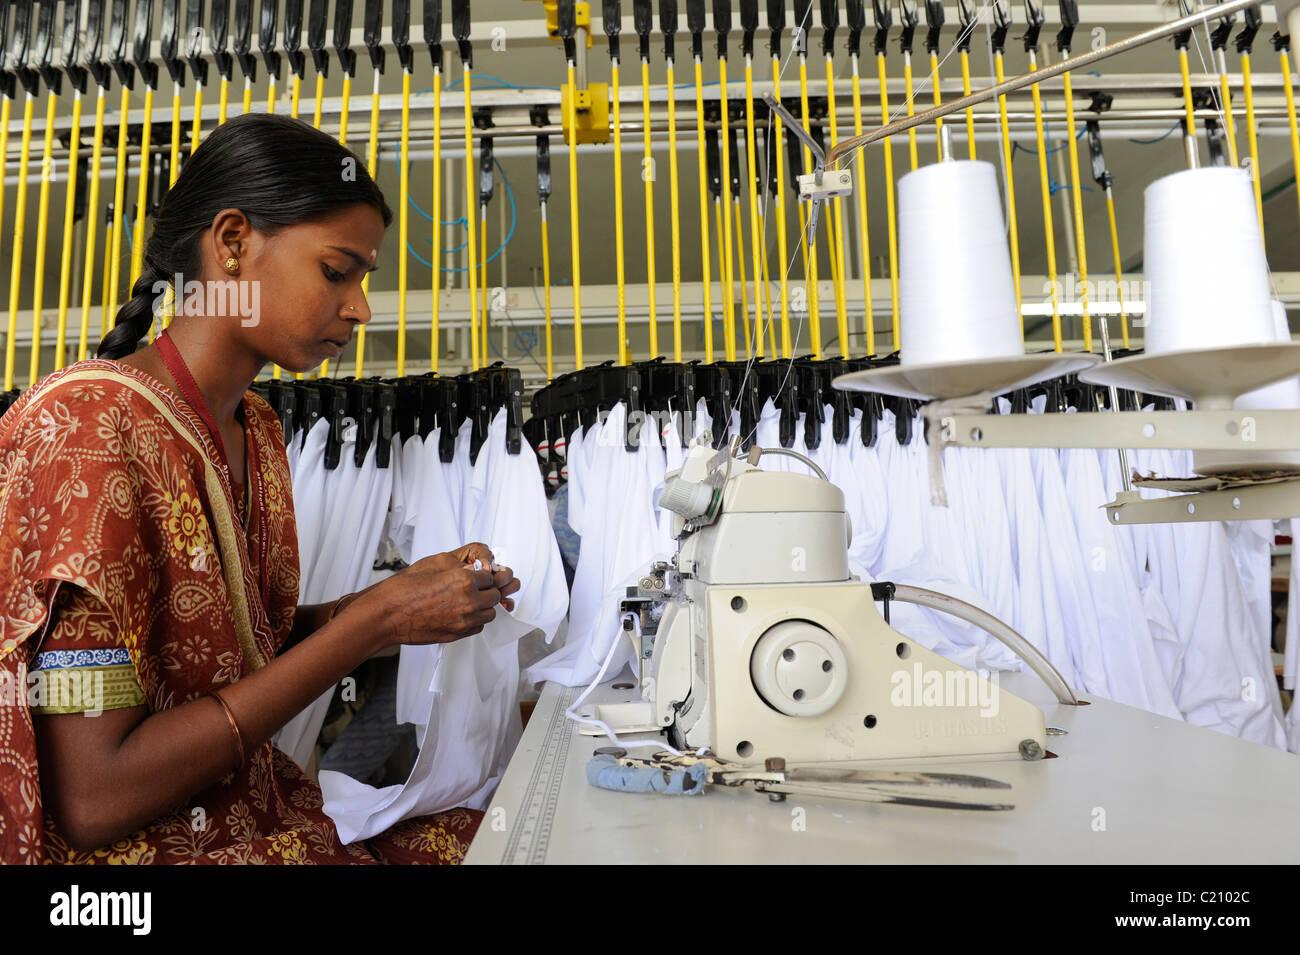 india tamil nadu tirupur women work in fair trade textile stock photo royalty free image. Black Bedroom Furniture Sets. Home Design Ideas